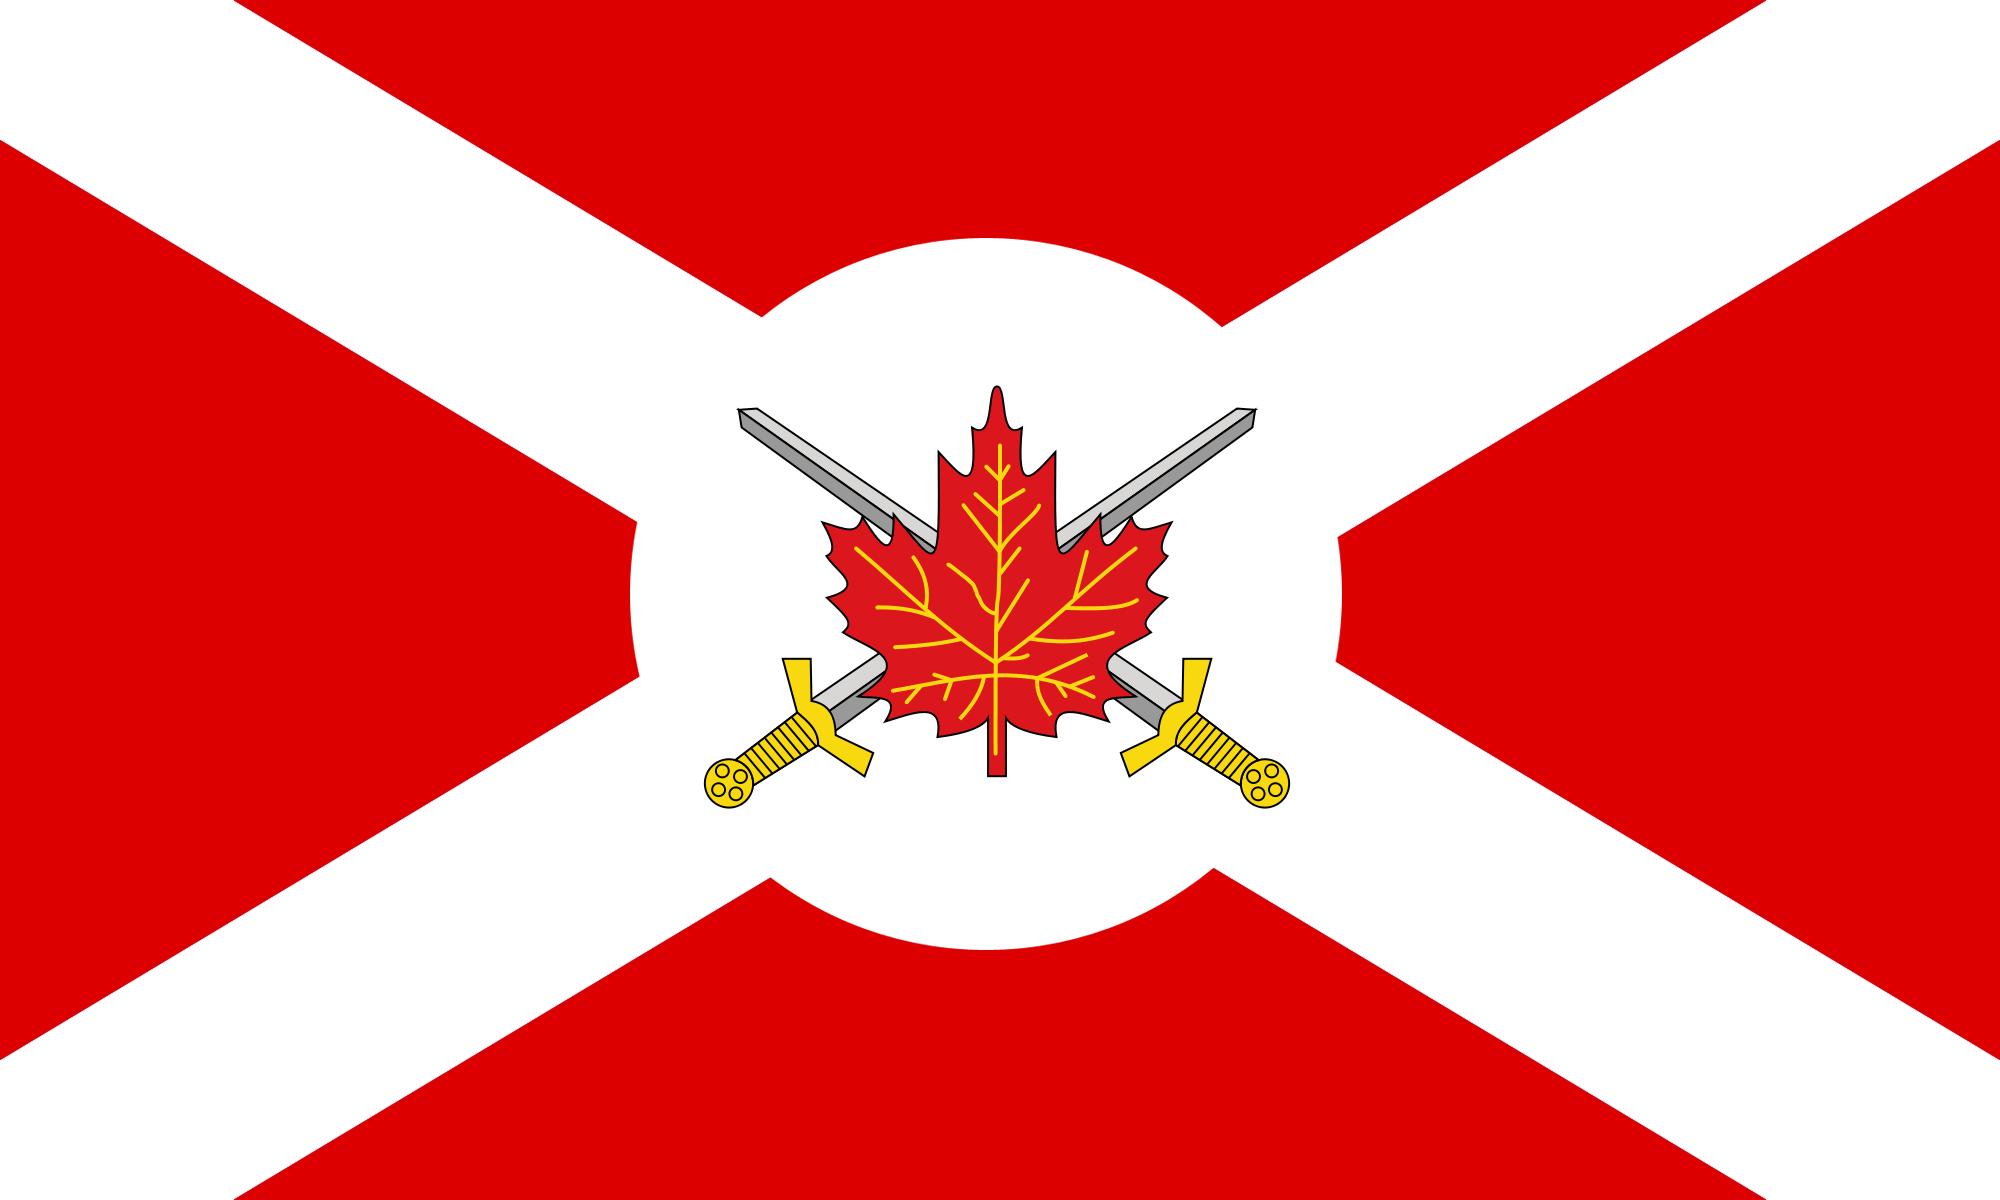 image flag of canada mondo de scopatore png alternative